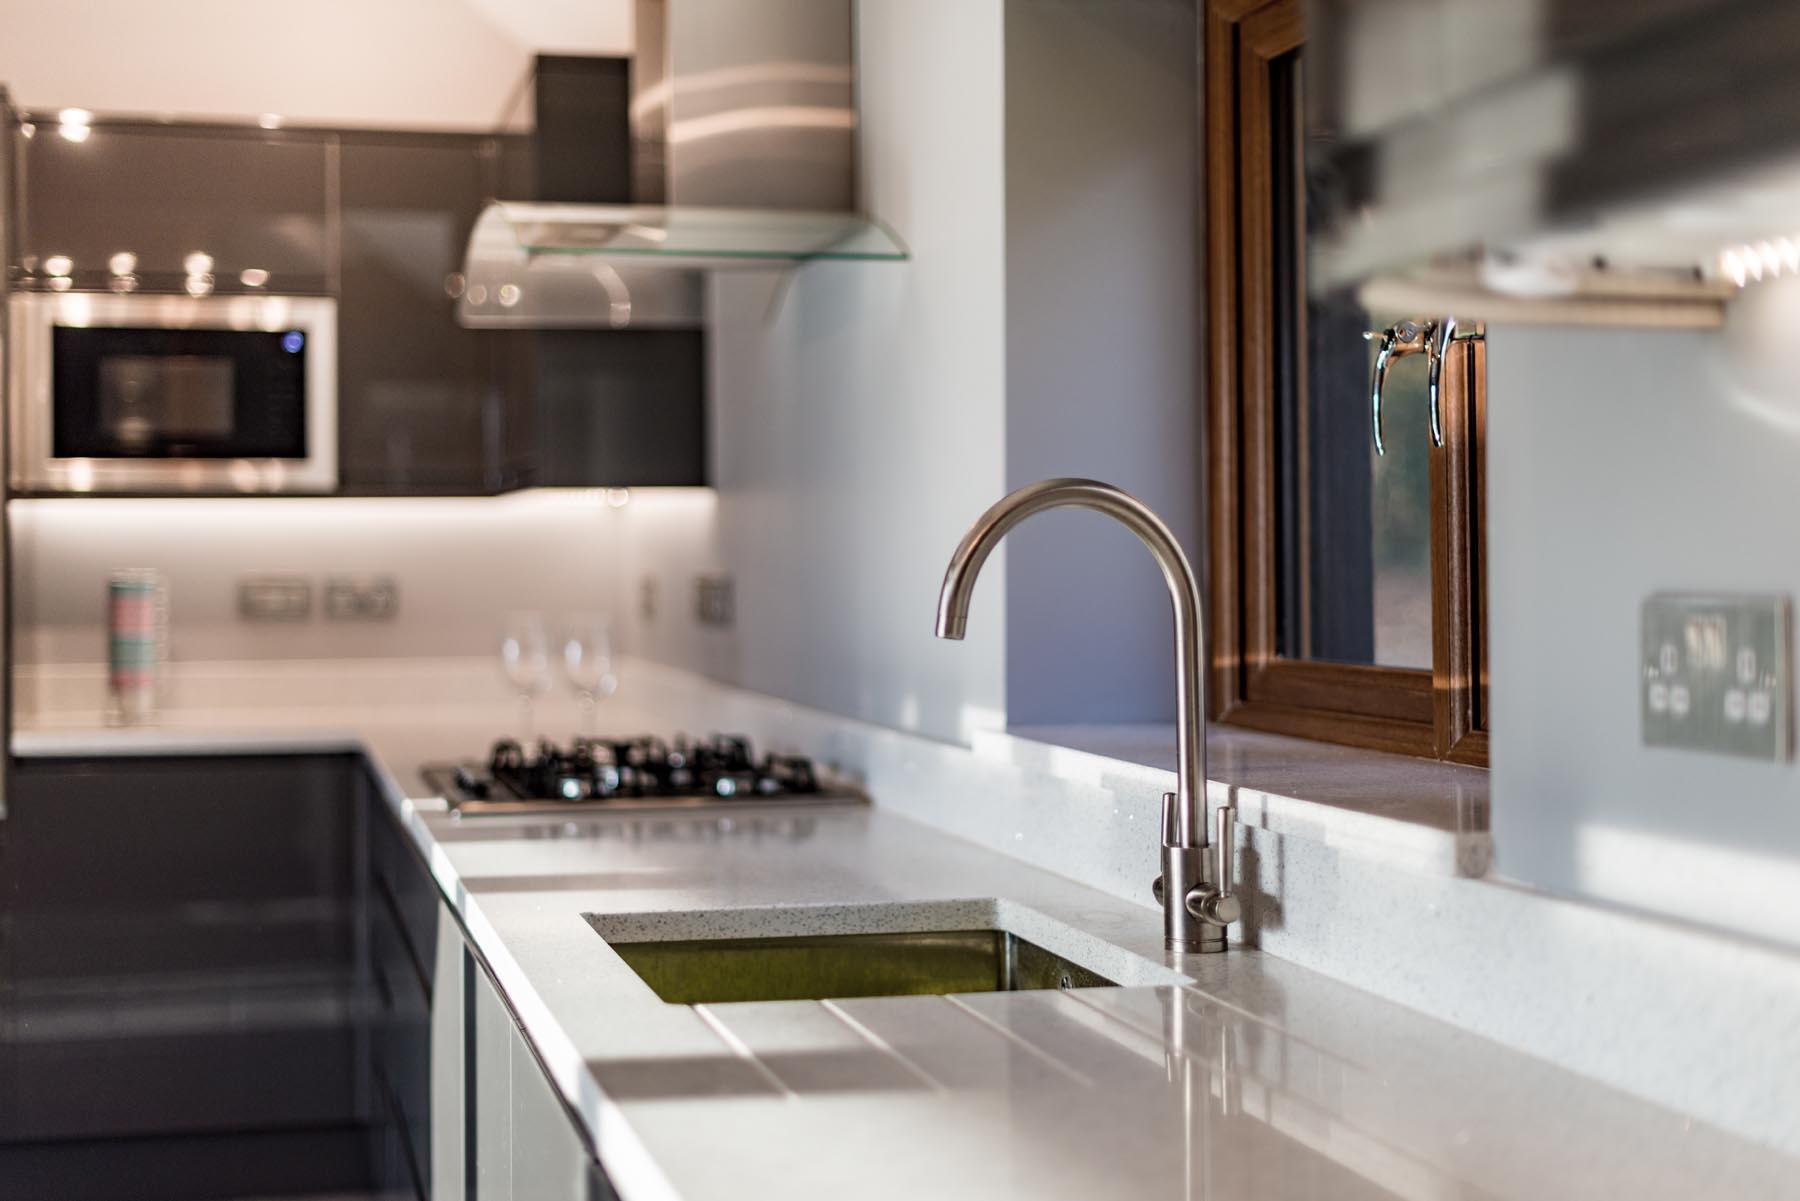 Silestone Worktops By Cosentino Quartz Kitchen Worktops